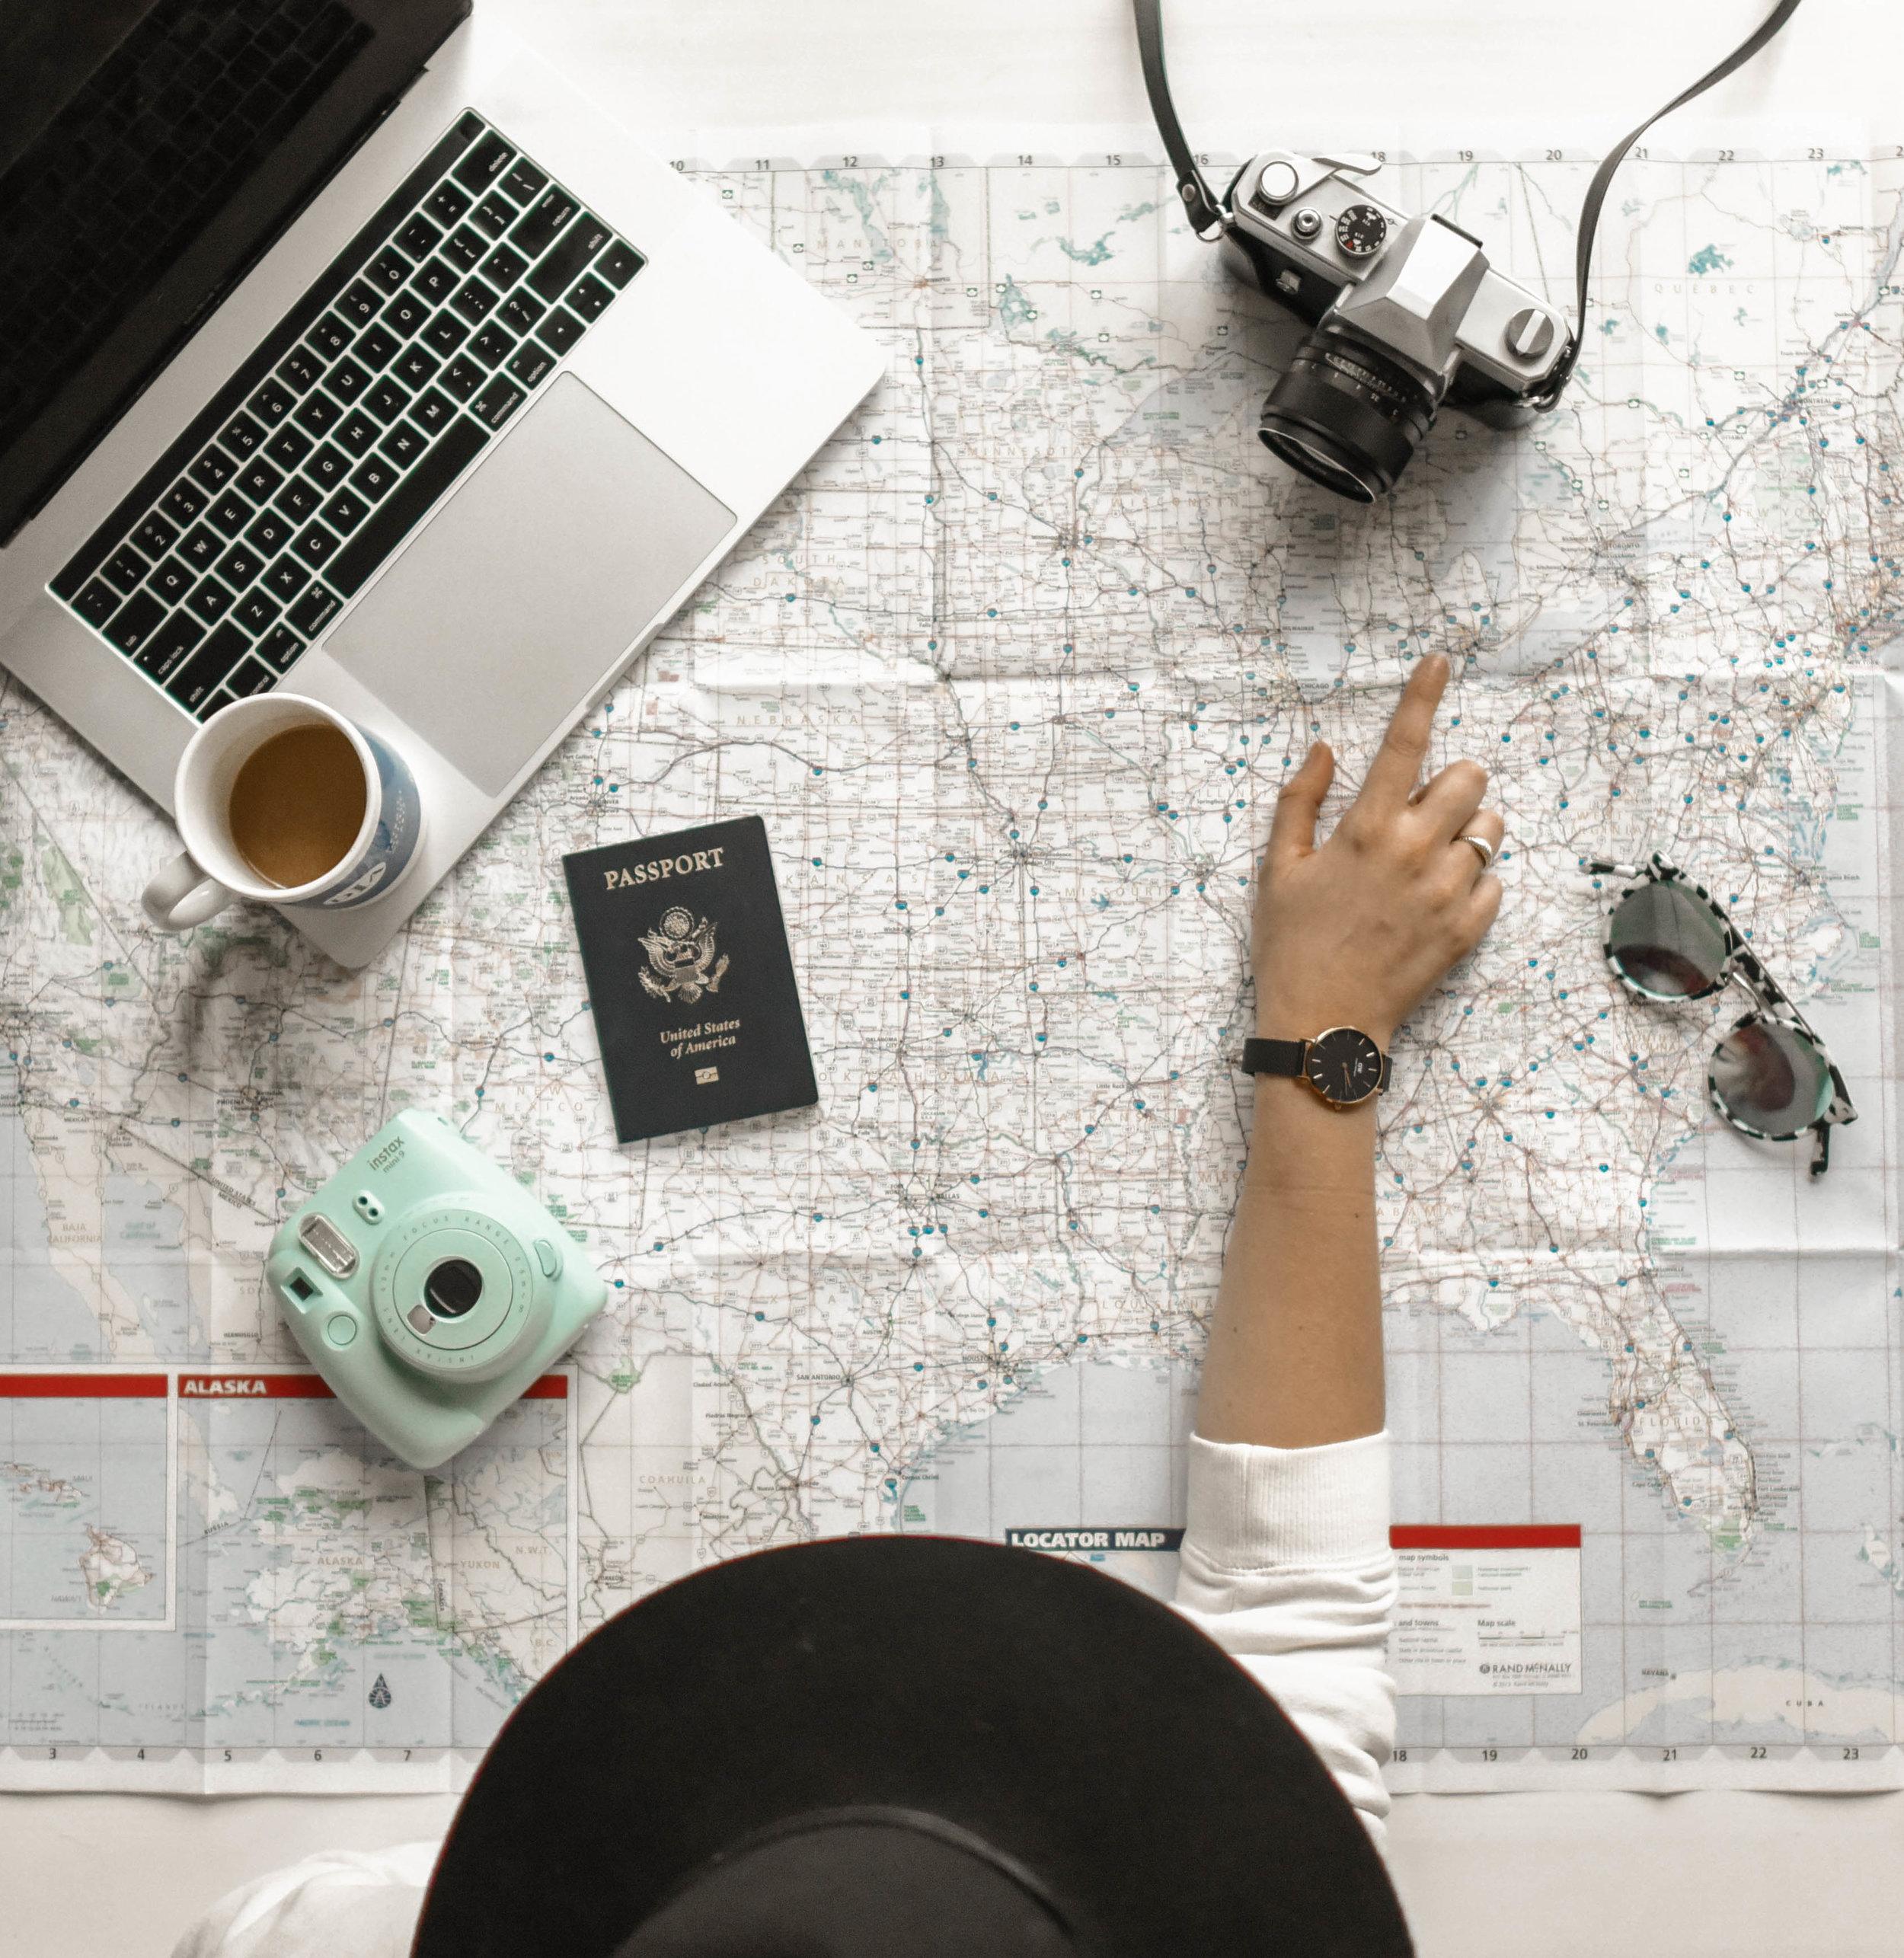 Nos services - Agence de voyage accessible